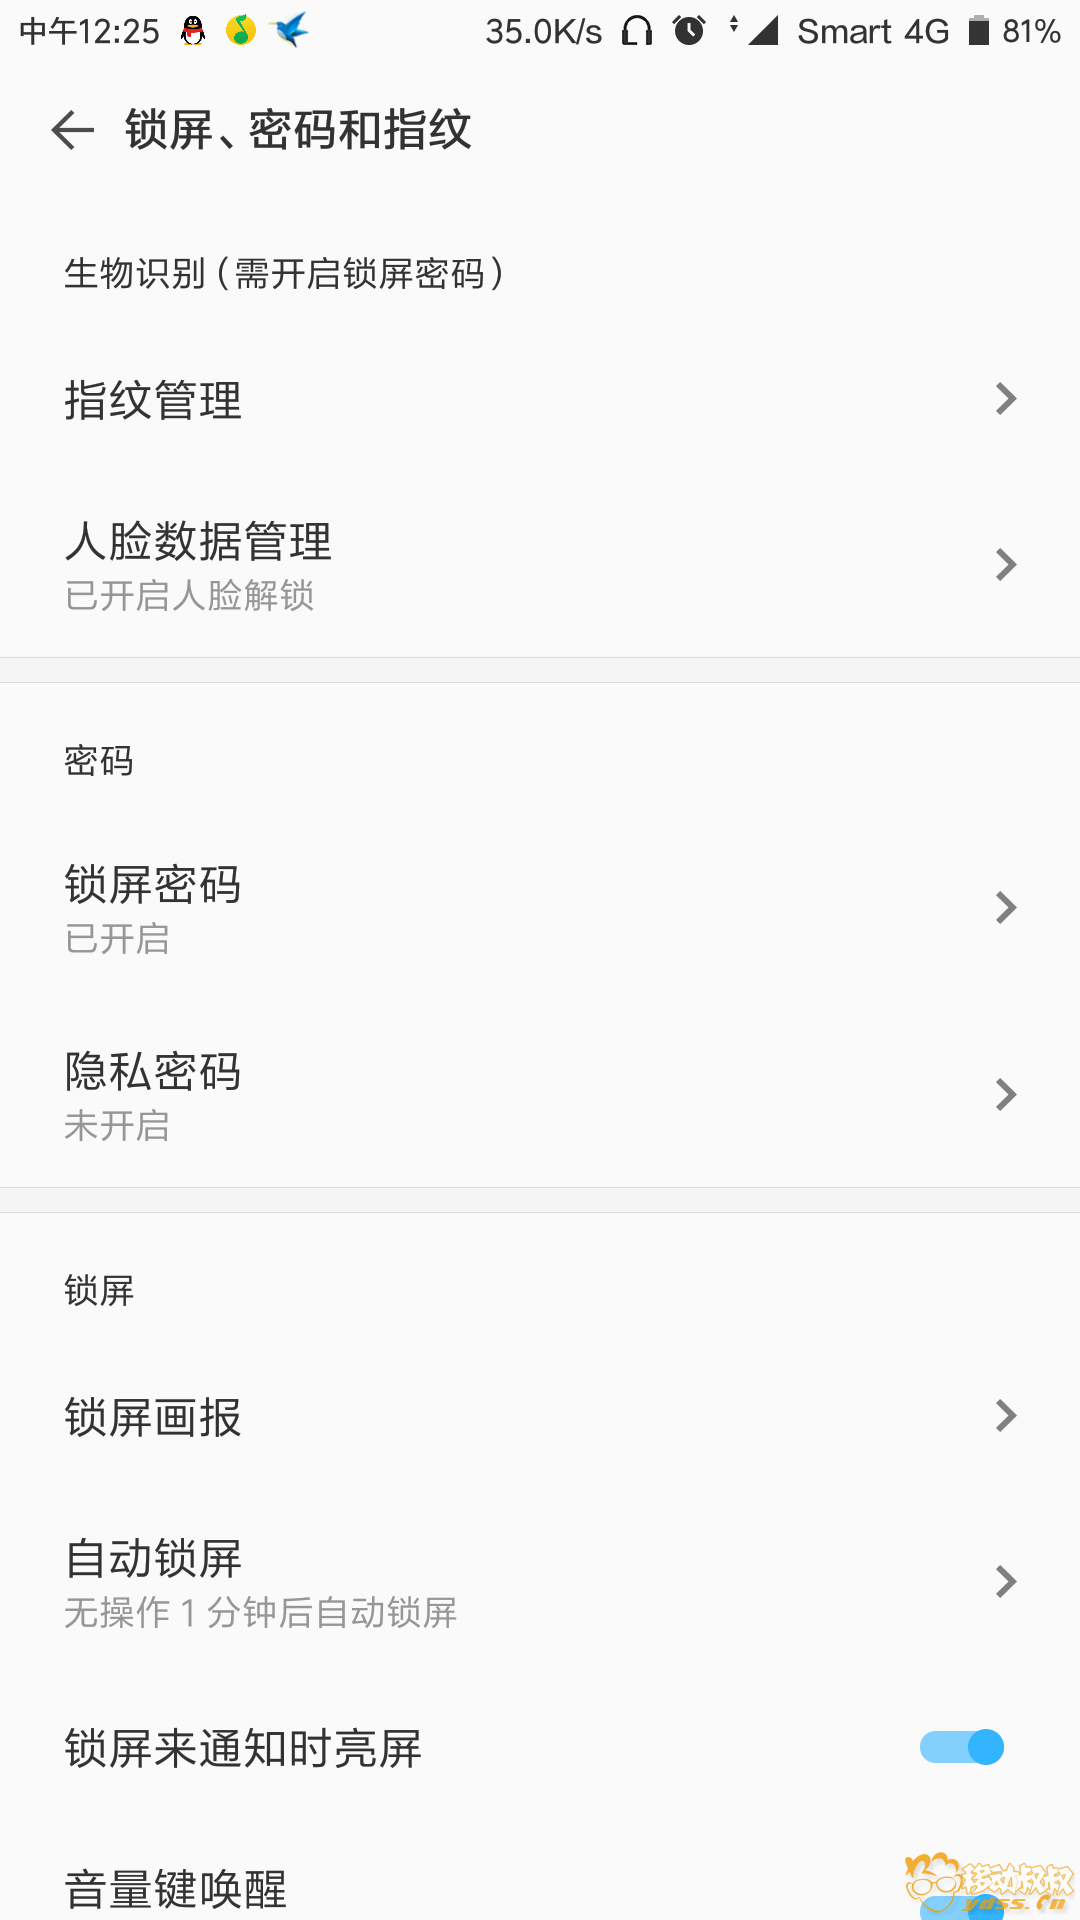 Screenshot_2018-02-07-12-25-59-152_com.android.settings.png